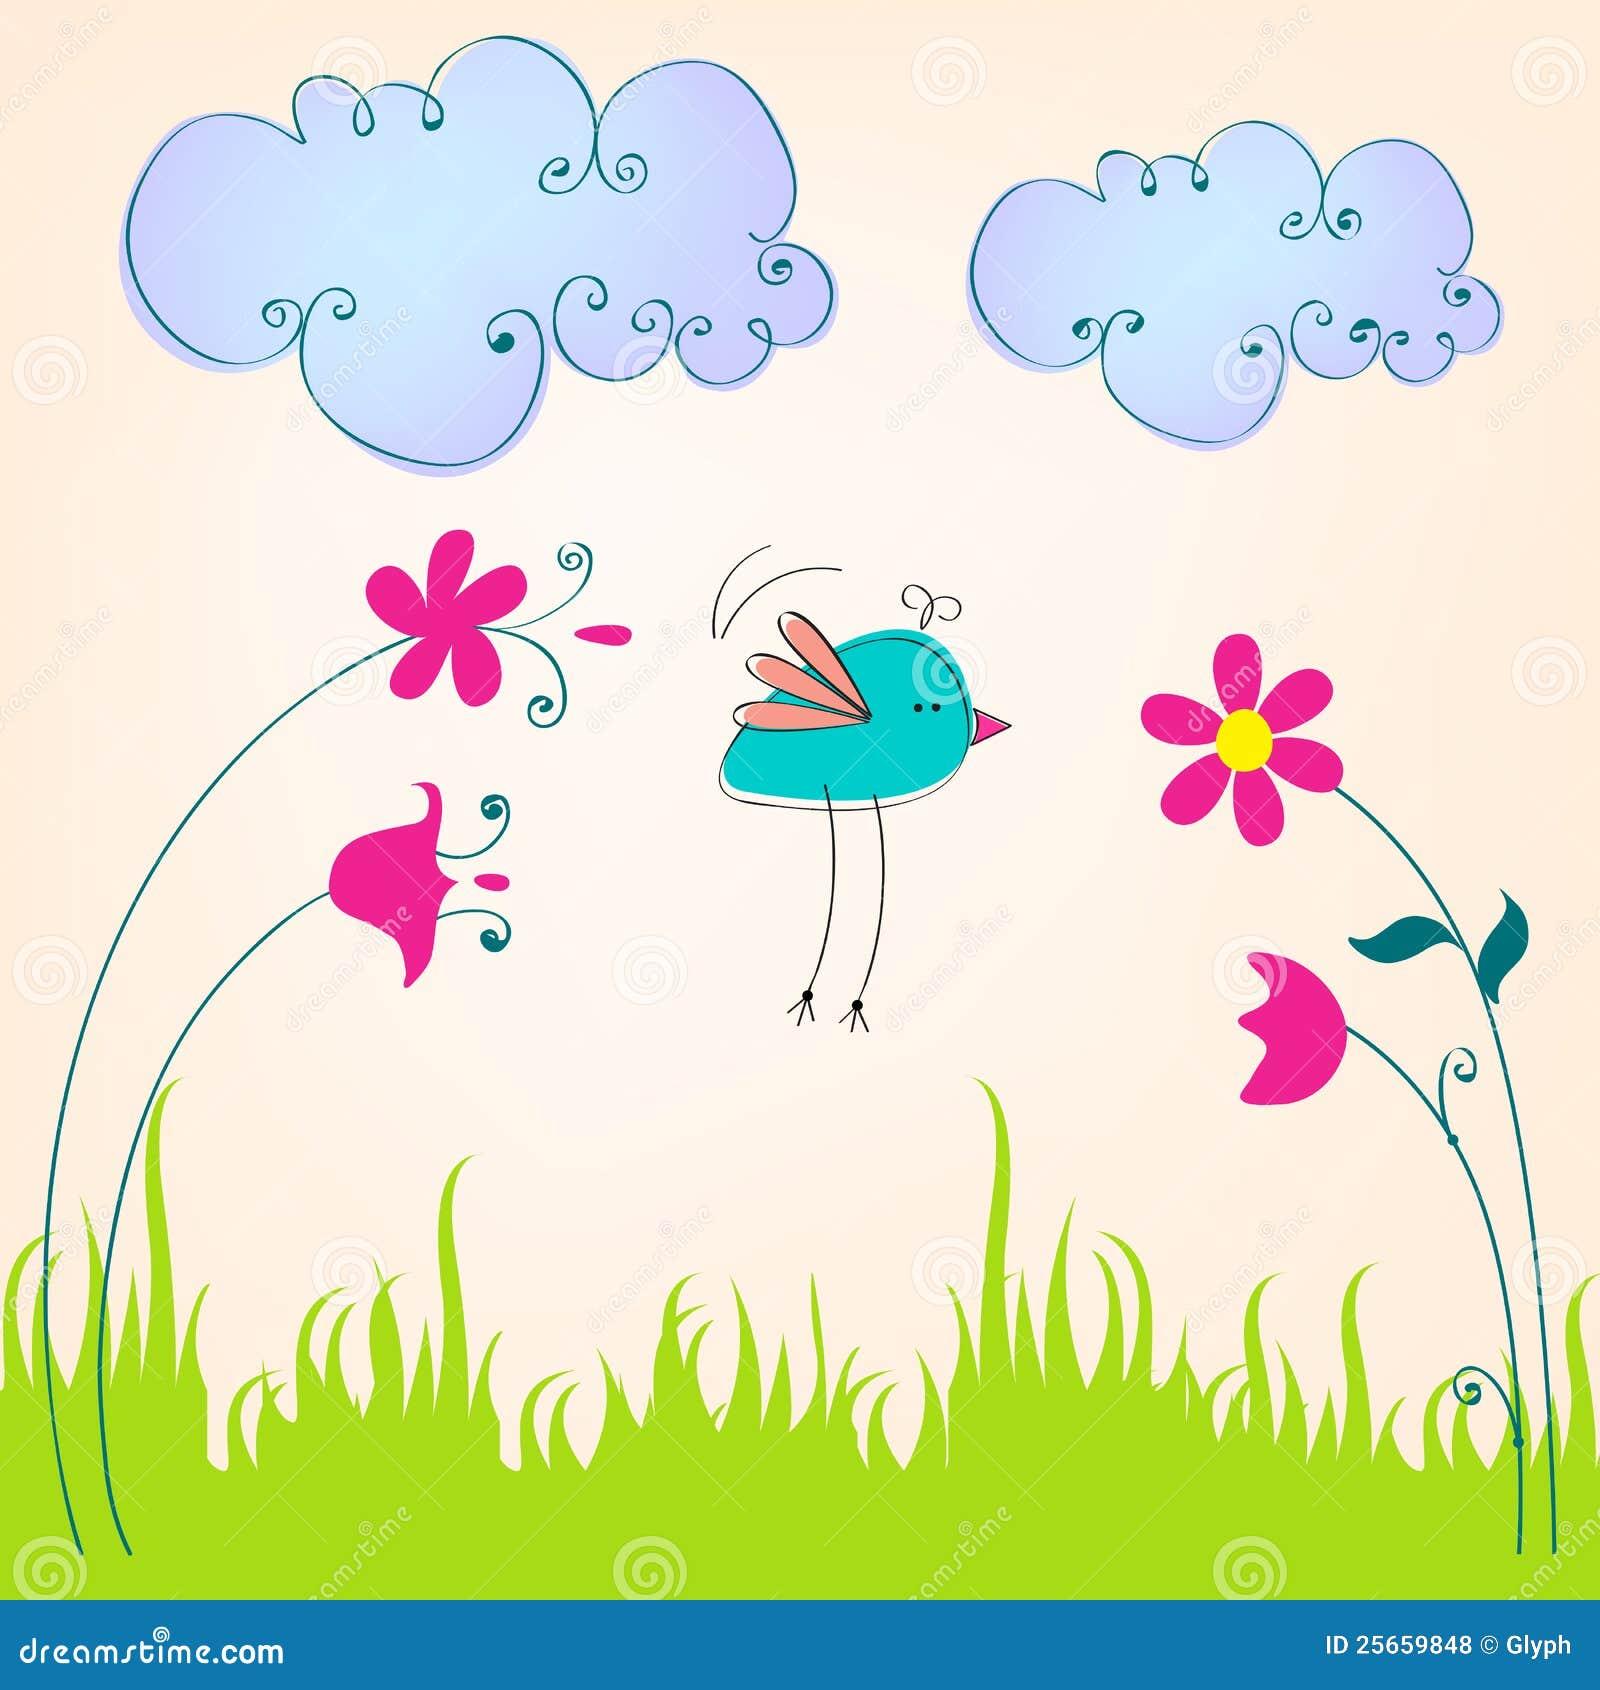 Cute Spring Bird Illustration Stock Vector - Image: 25659848